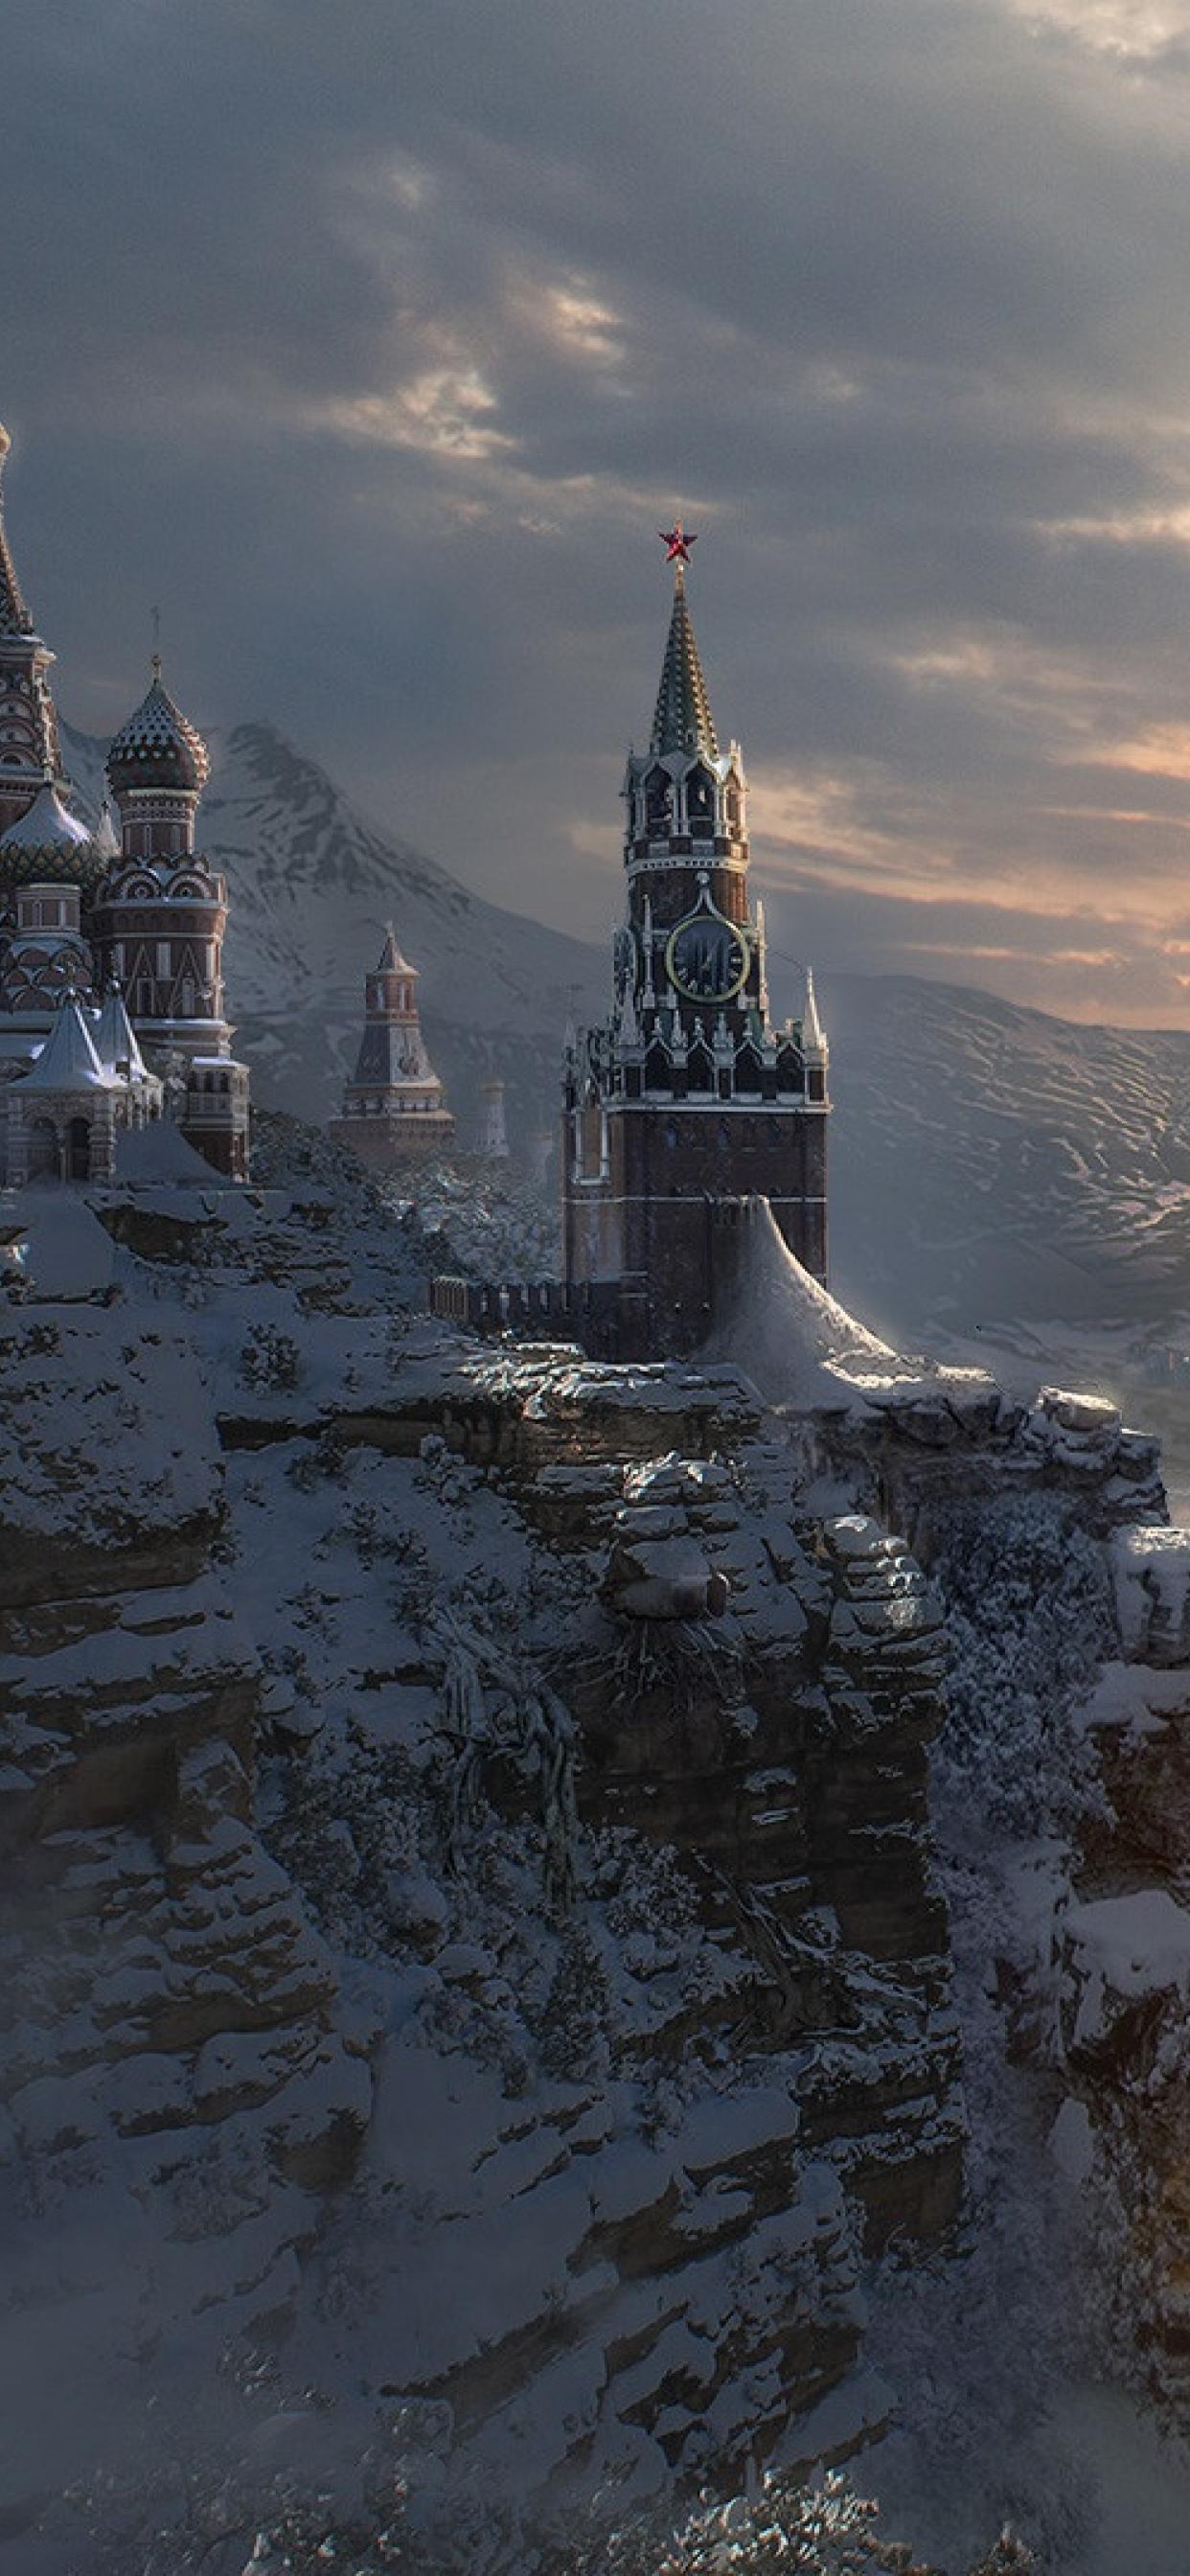 1242x2688 Winter In Russia Iphone Xs Max Wallpaper Hd City